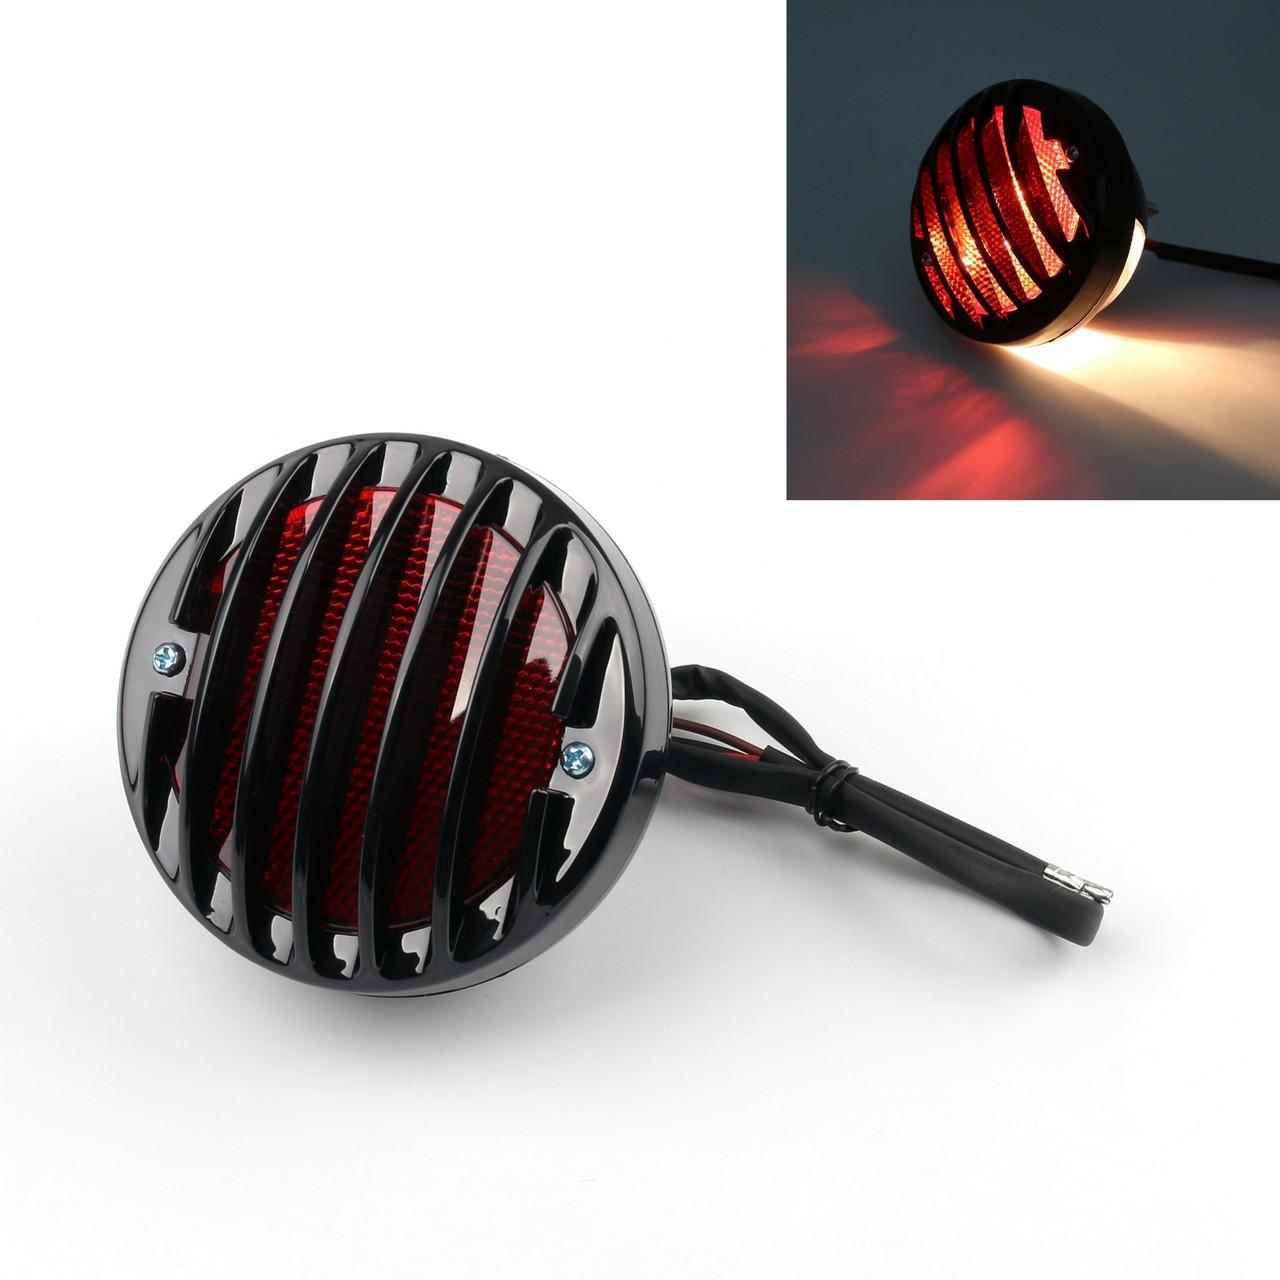 http://www.madhornets.store/AMZ/MotoPart/Taillight/TL-301/TL-301-Black-1.jpg